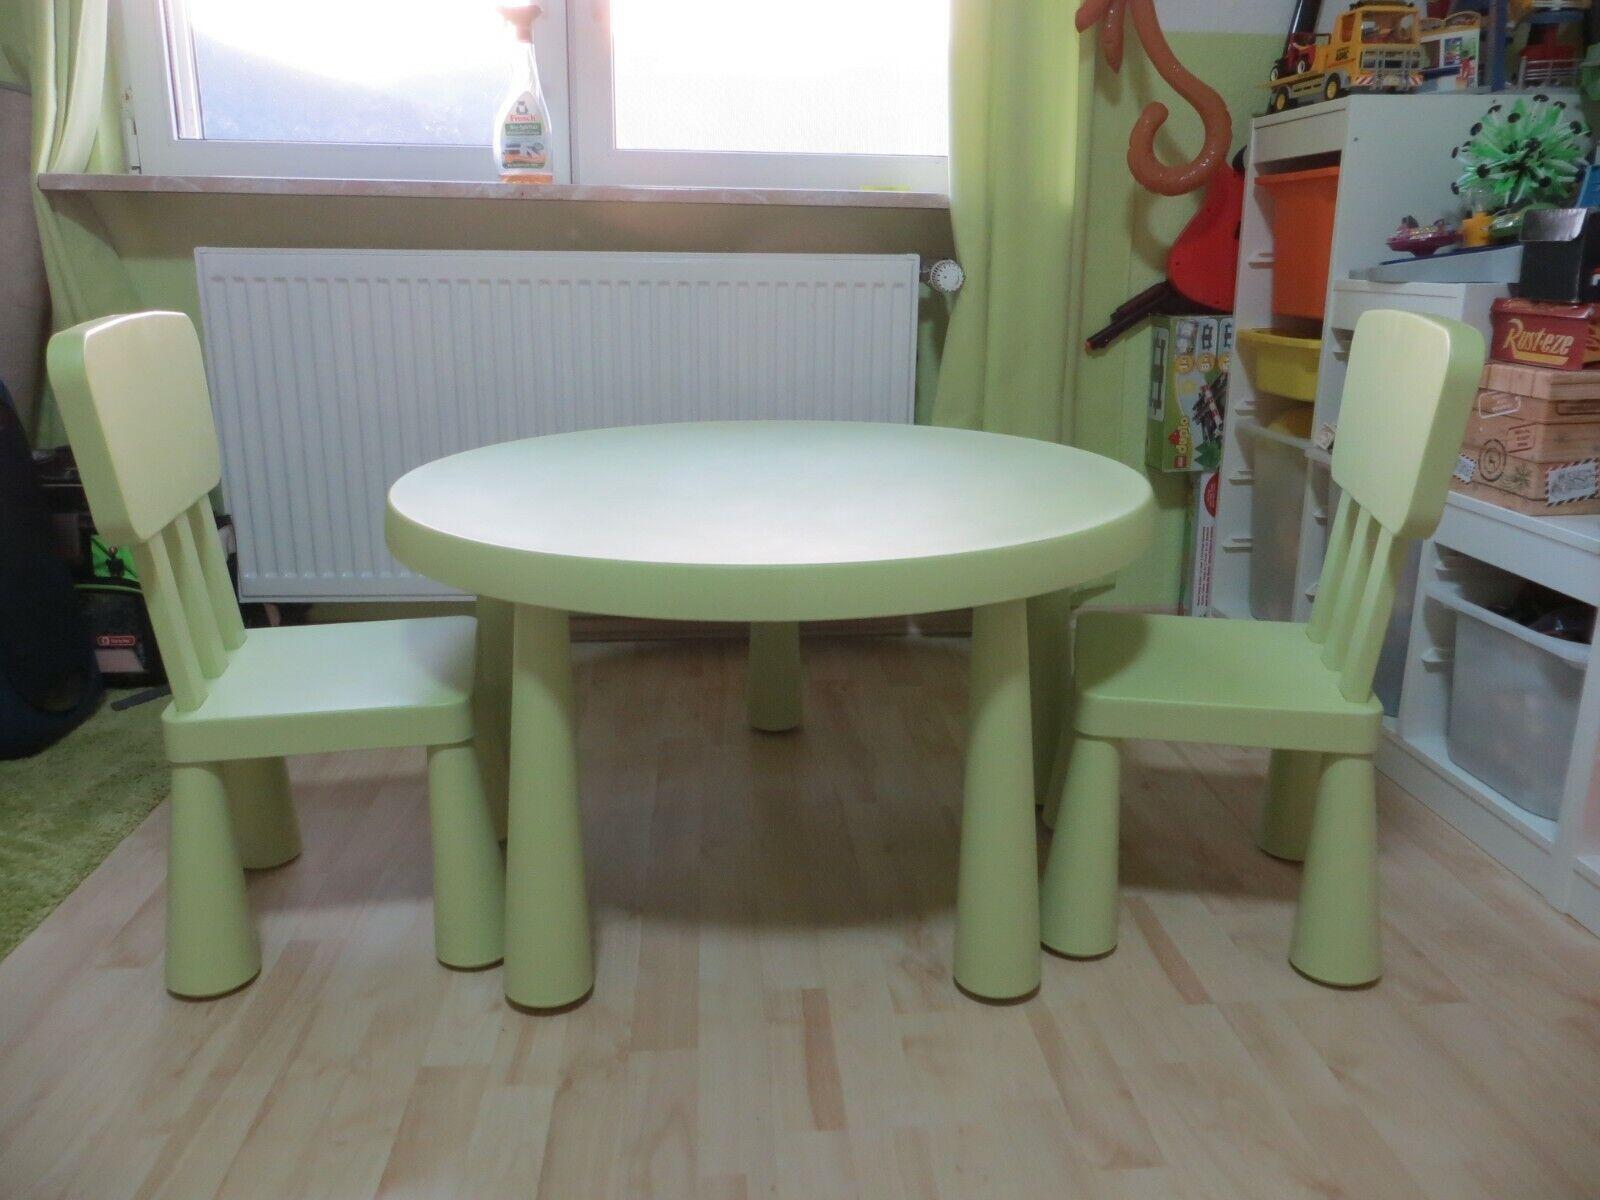 IKEA Mammut Kinder Sitzgruppe Tisch zwei Stühle grün